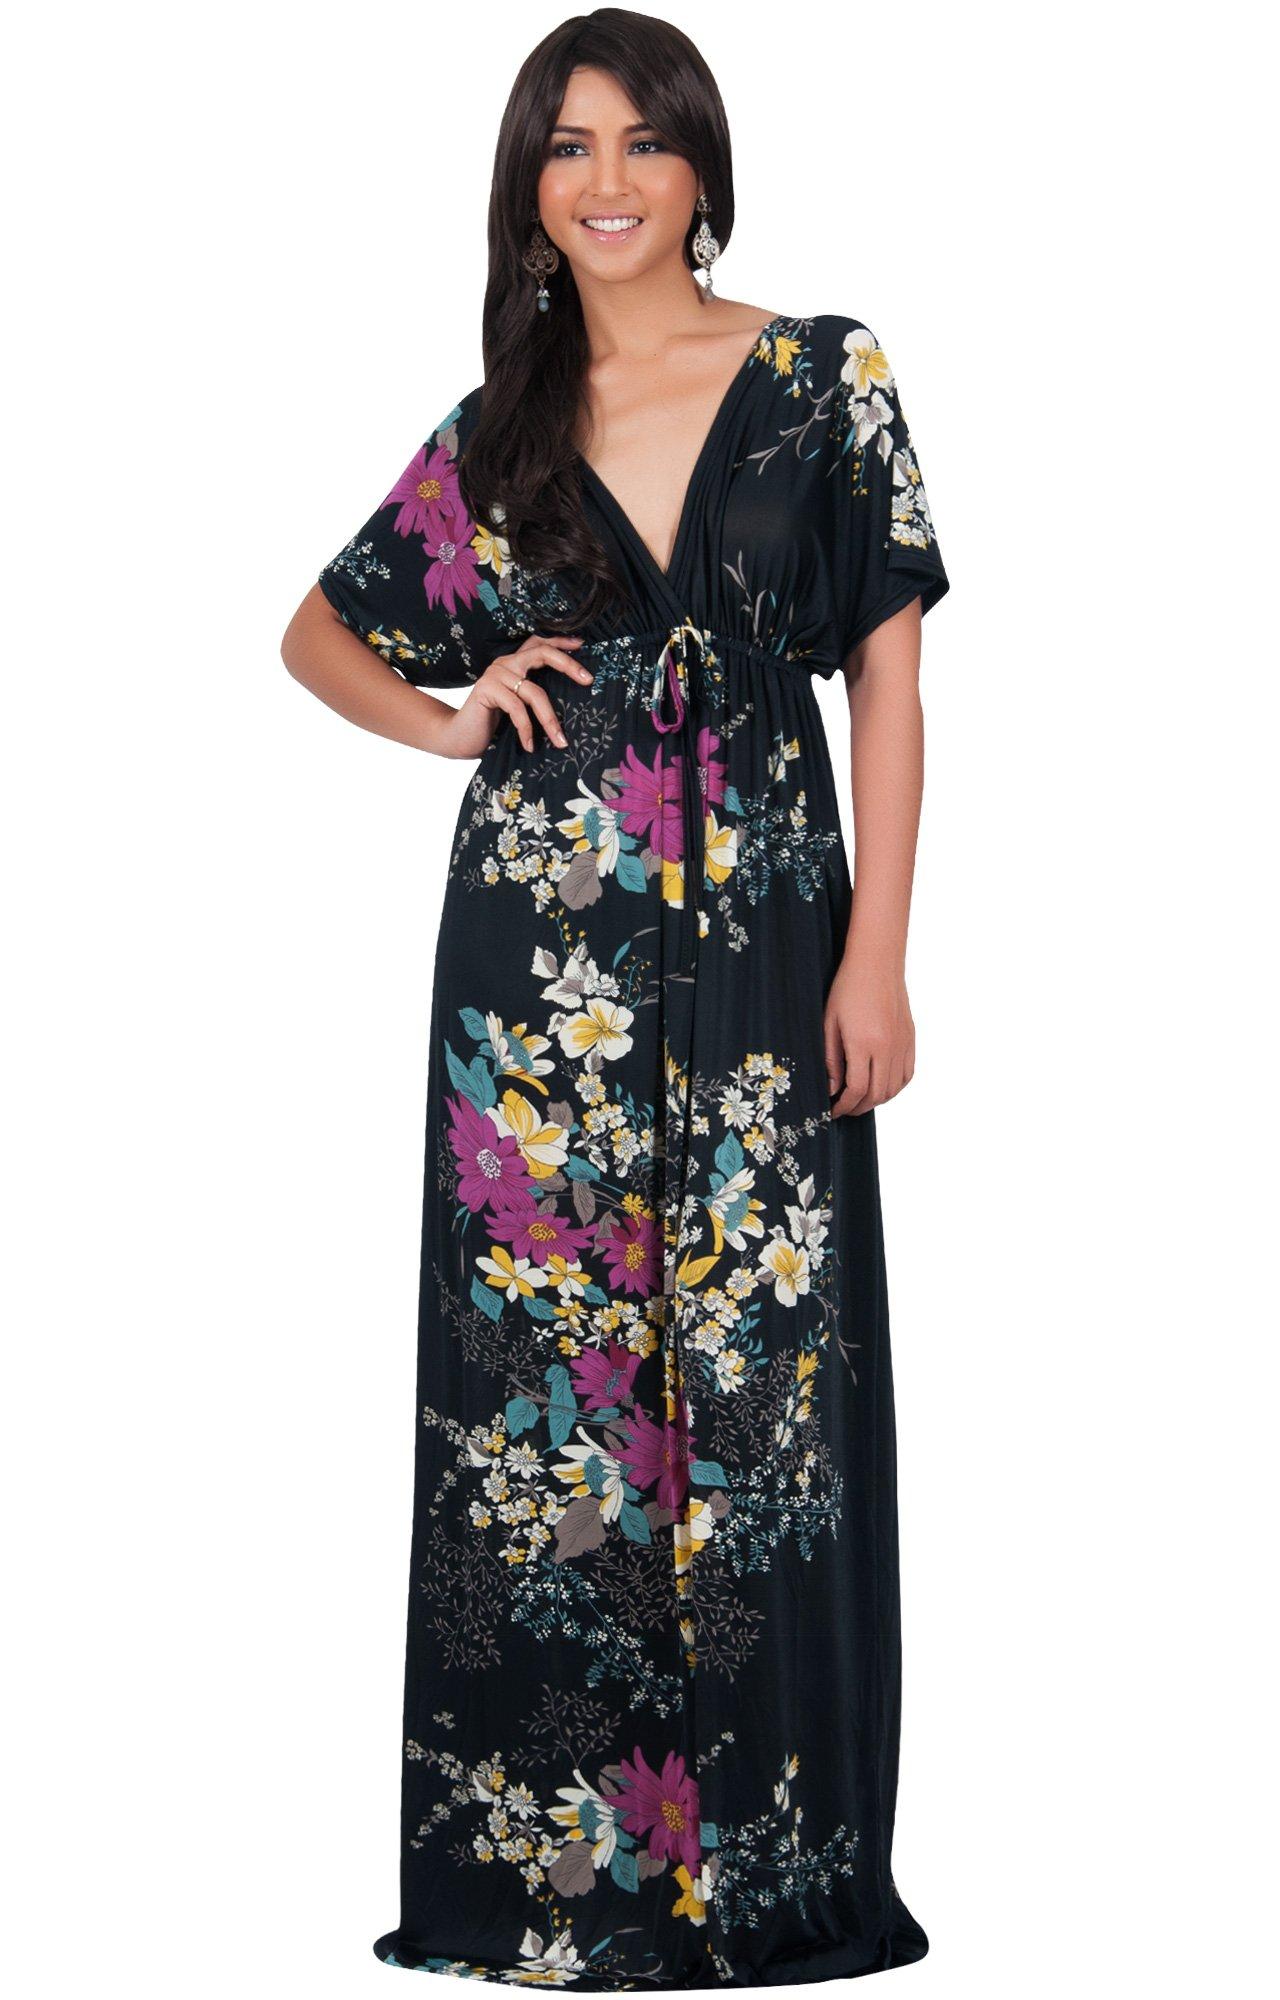 b25172229f8 KOH KOH Plus Size Womens Long Summer Floral Flower Print Sexy Kaftan Caftan  Beach Casual Flowy Hawaiin Sun Cover-up Sundress Sundresses Gown Gowns Maxi  ...